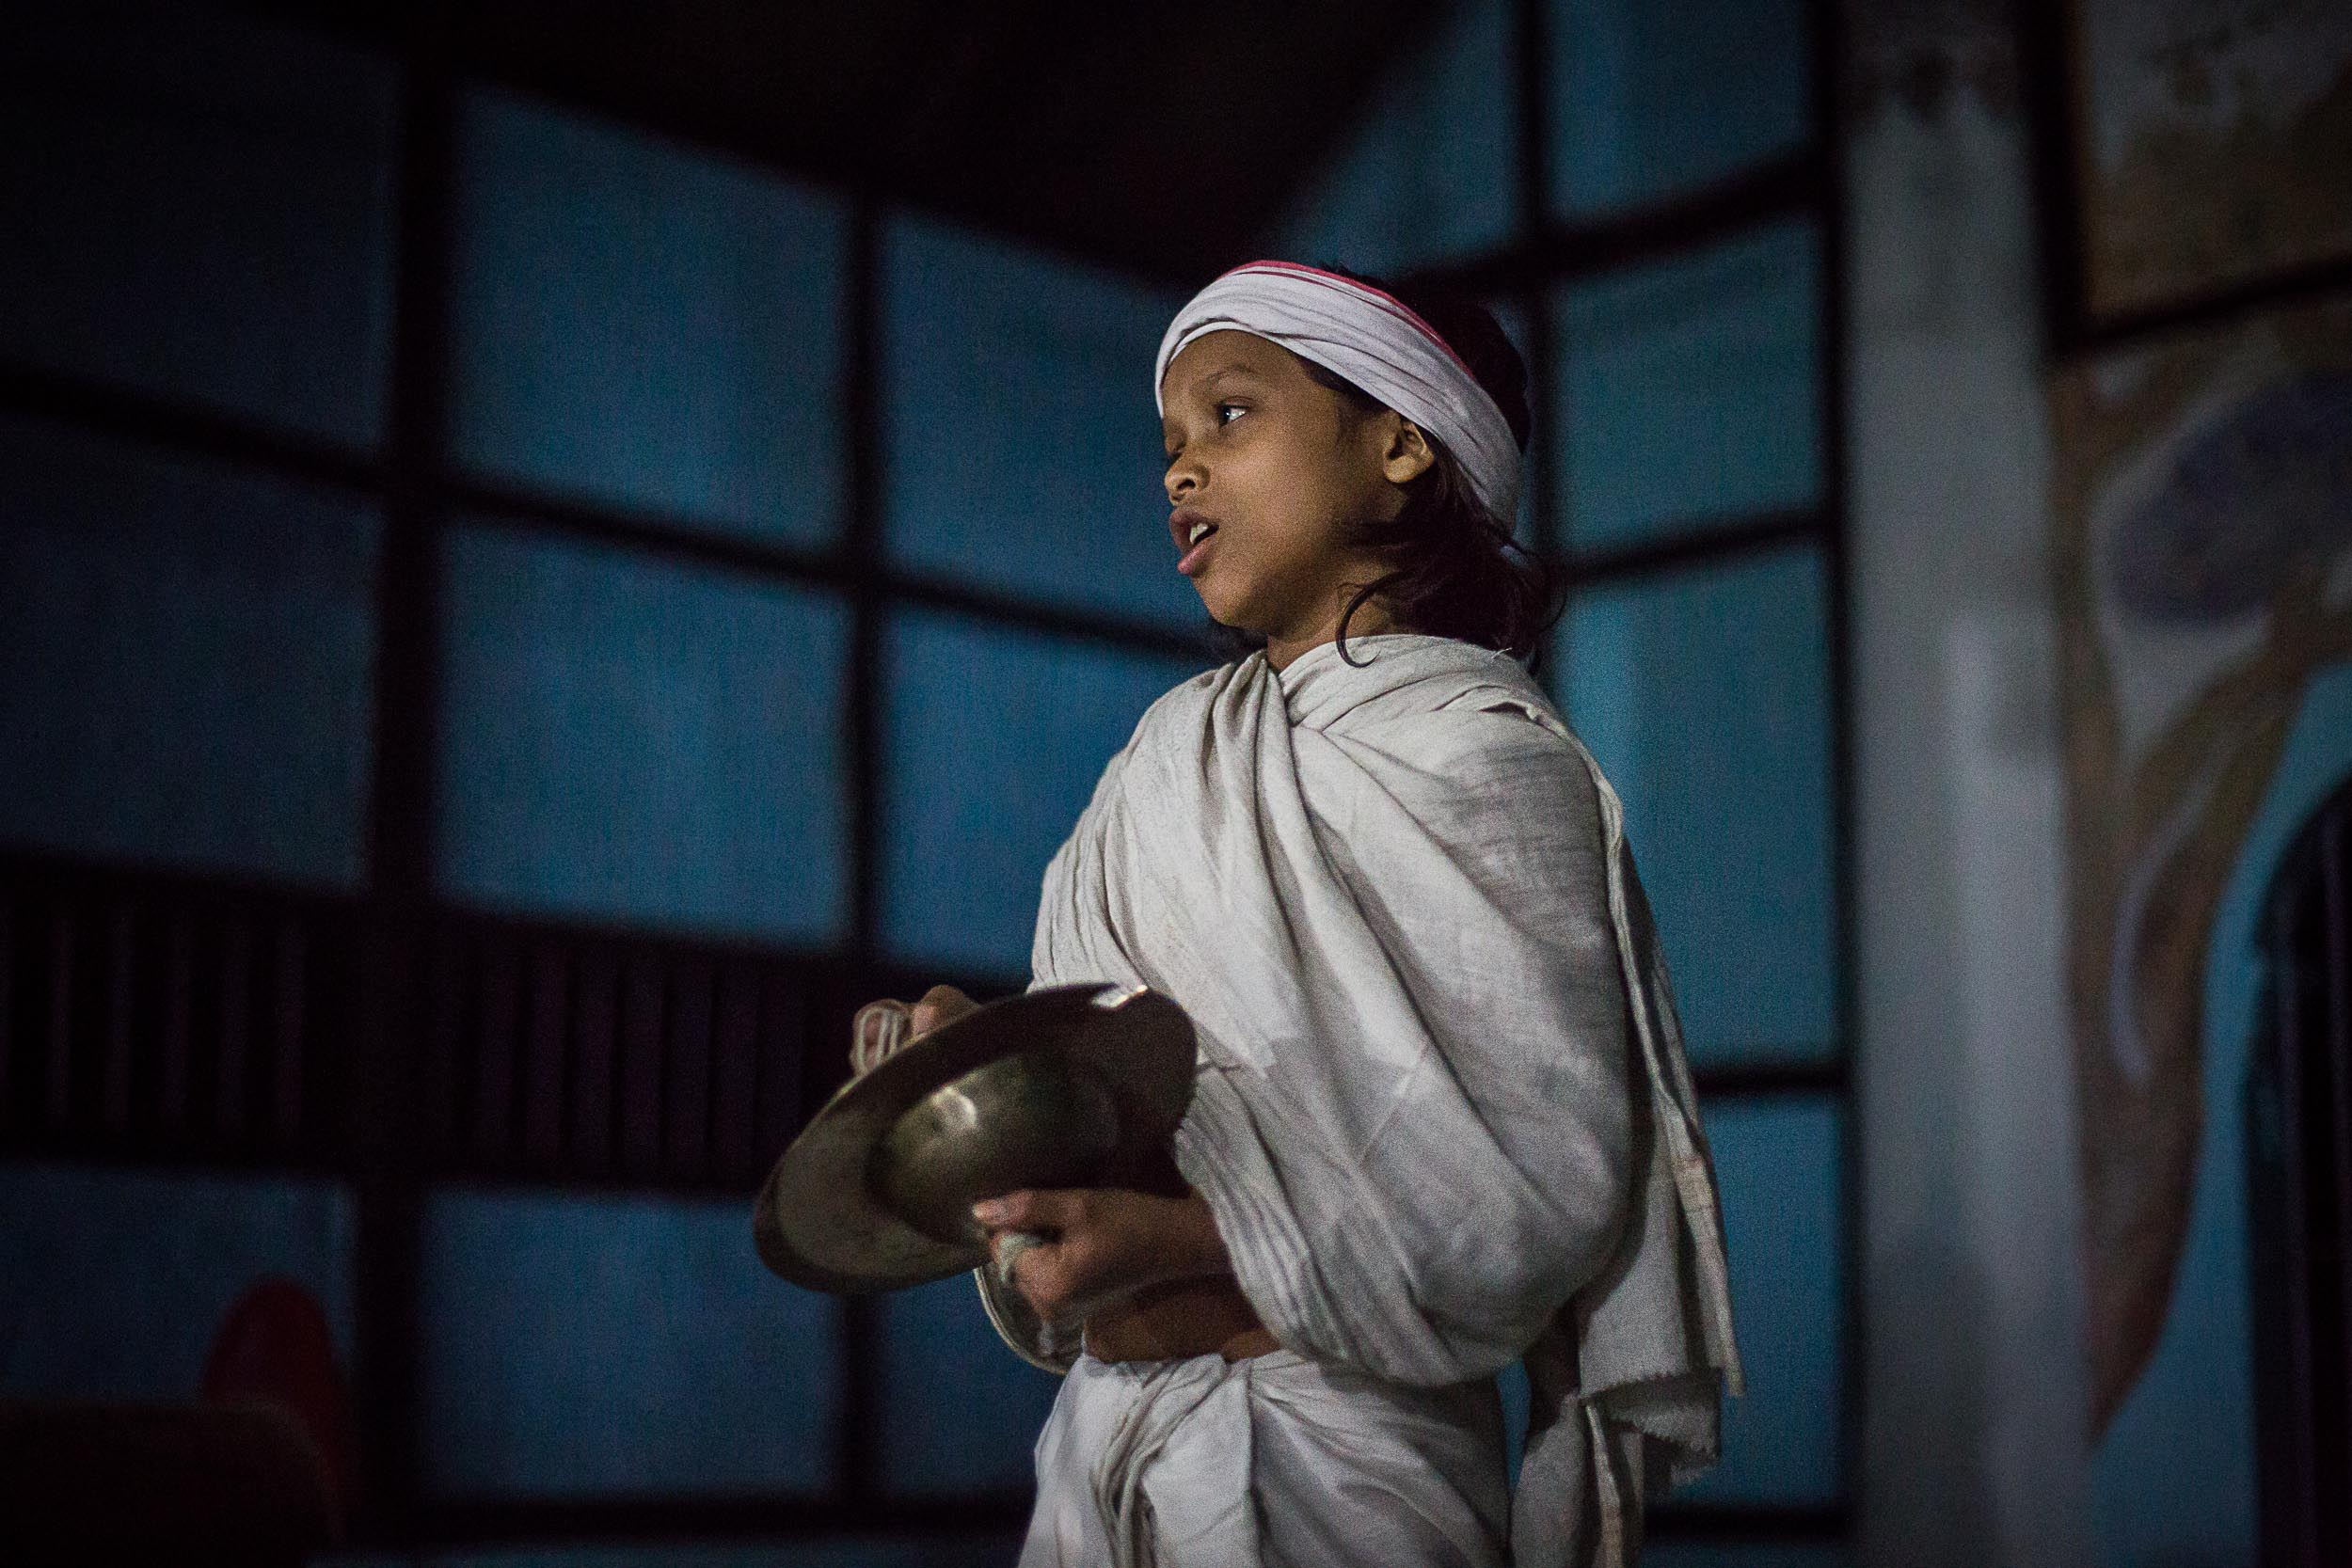 Sindhur_Photography_Travel_People_Majuli-48.JPG